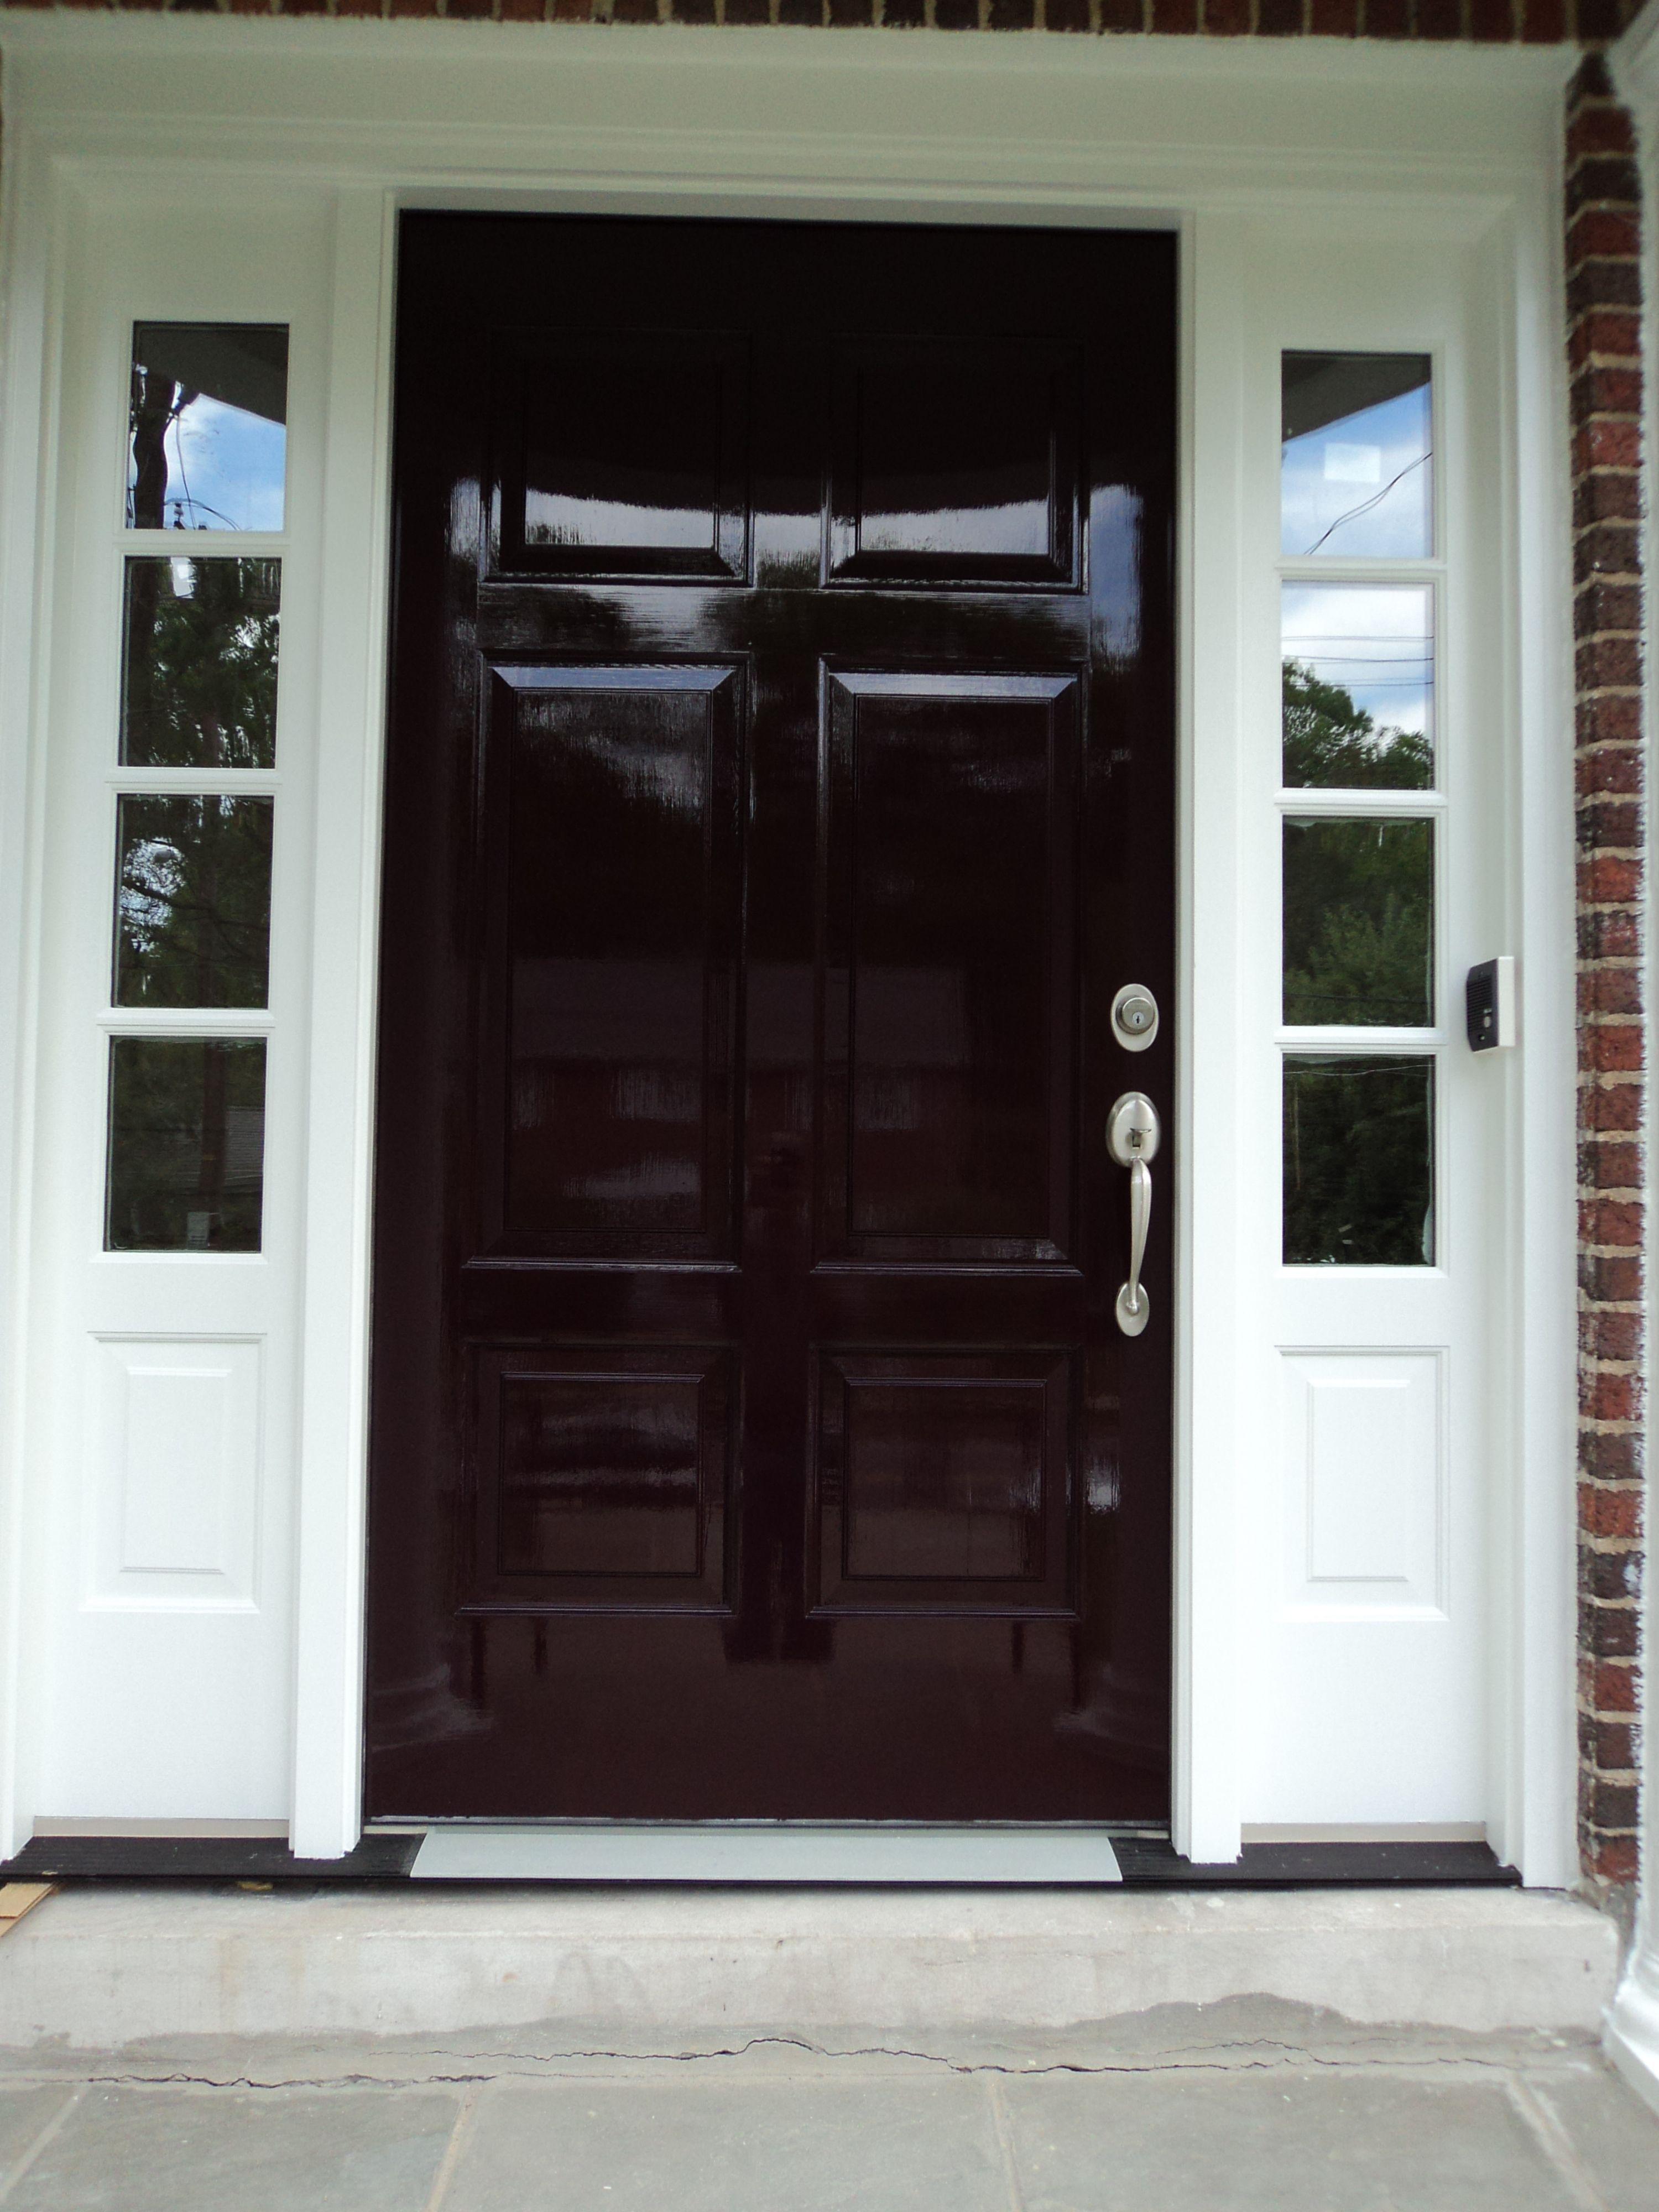 Hollandlac Brilliant Enamel Base Google Search House Front Door Design Fine Paints Of Europe Front Door Entryway